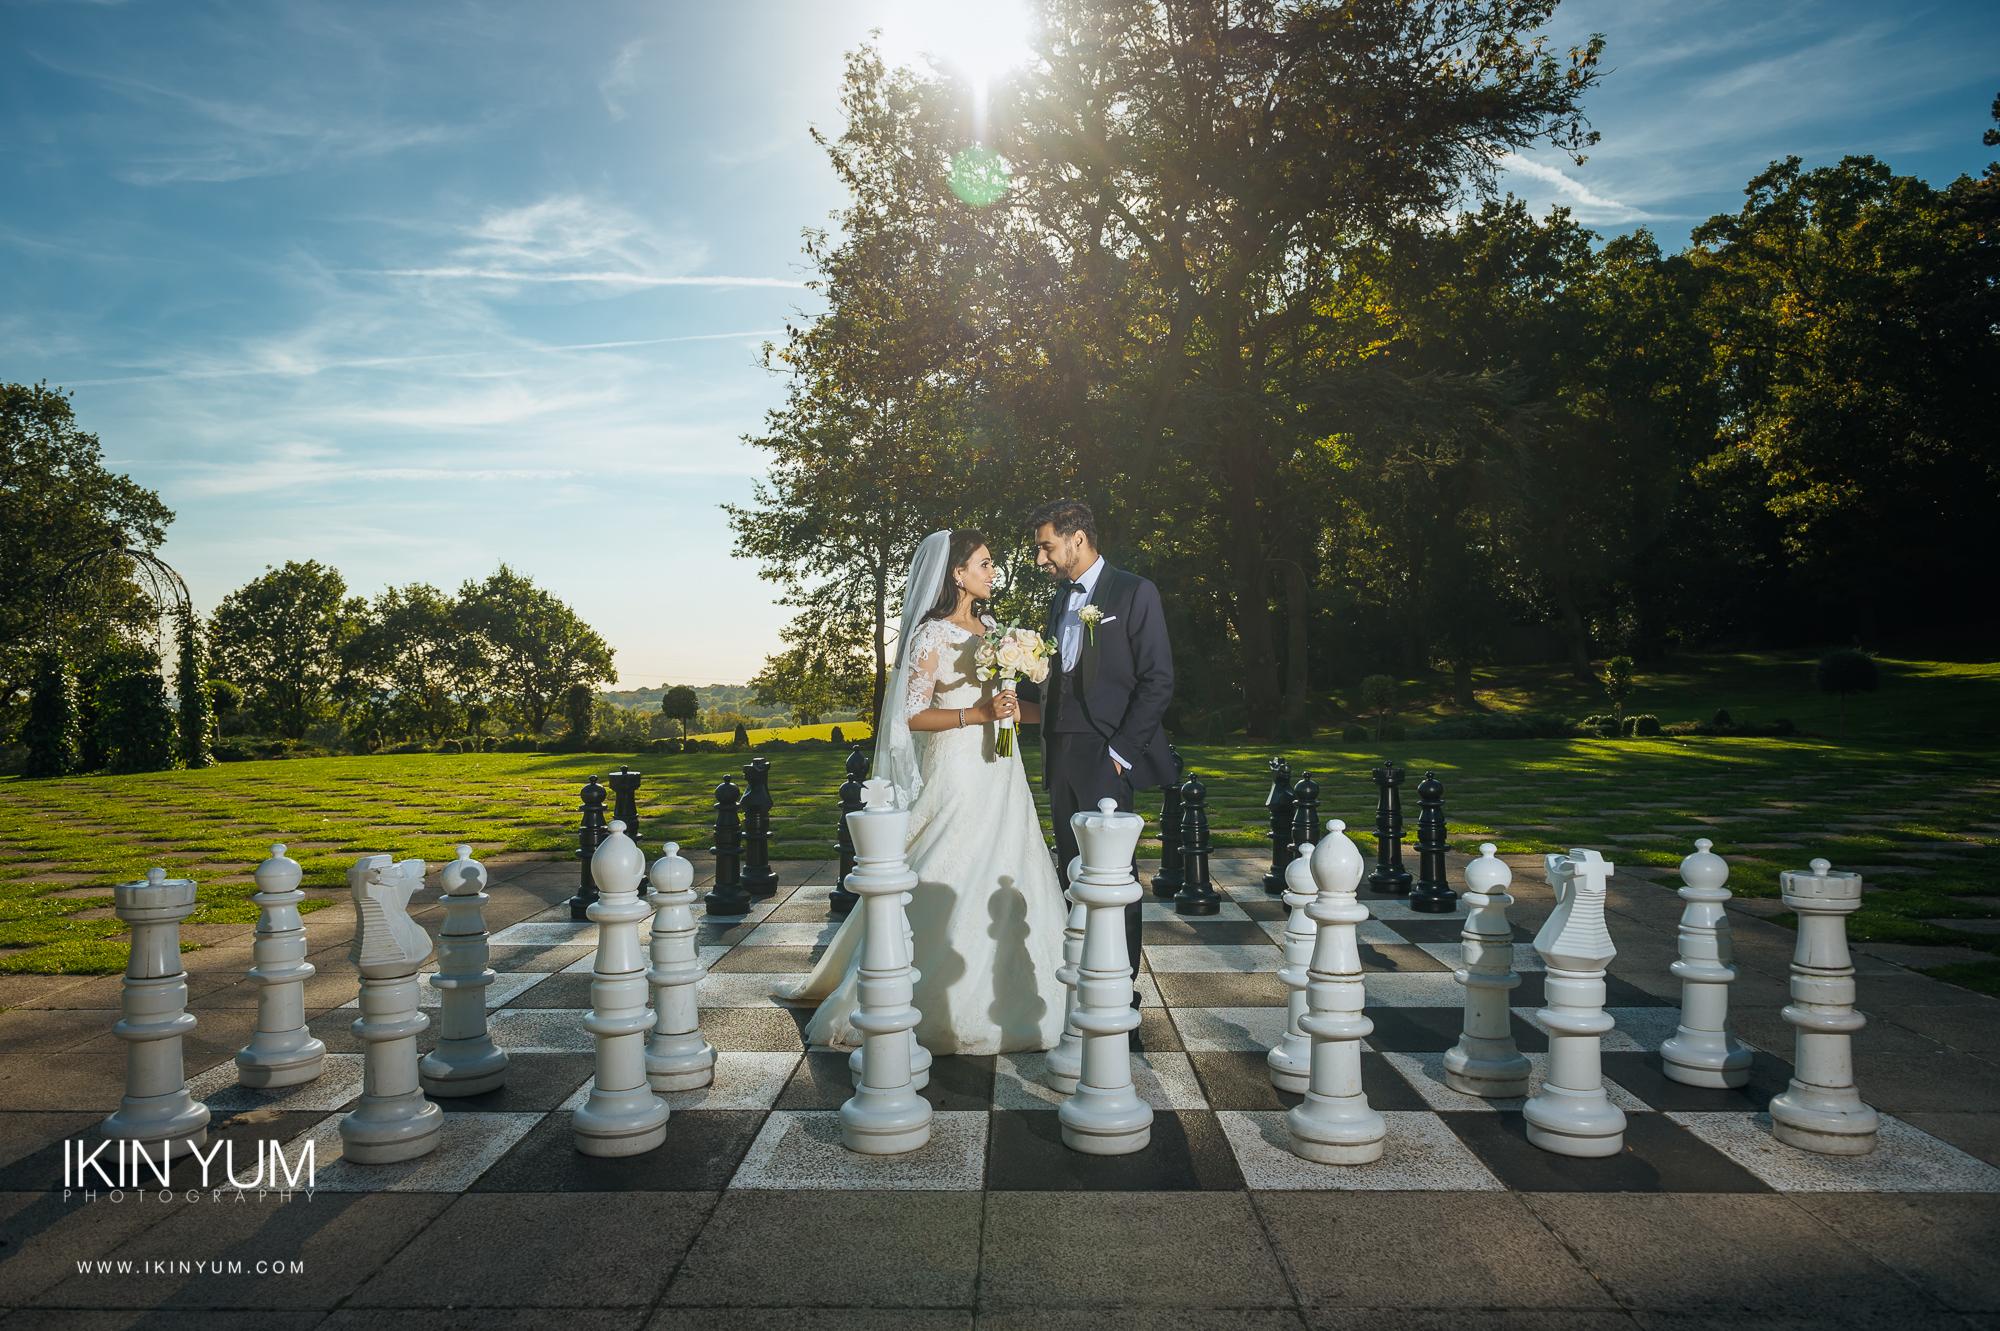 Laura Ashley Manor Wedding - Ikin Yum Photography-092.jpg